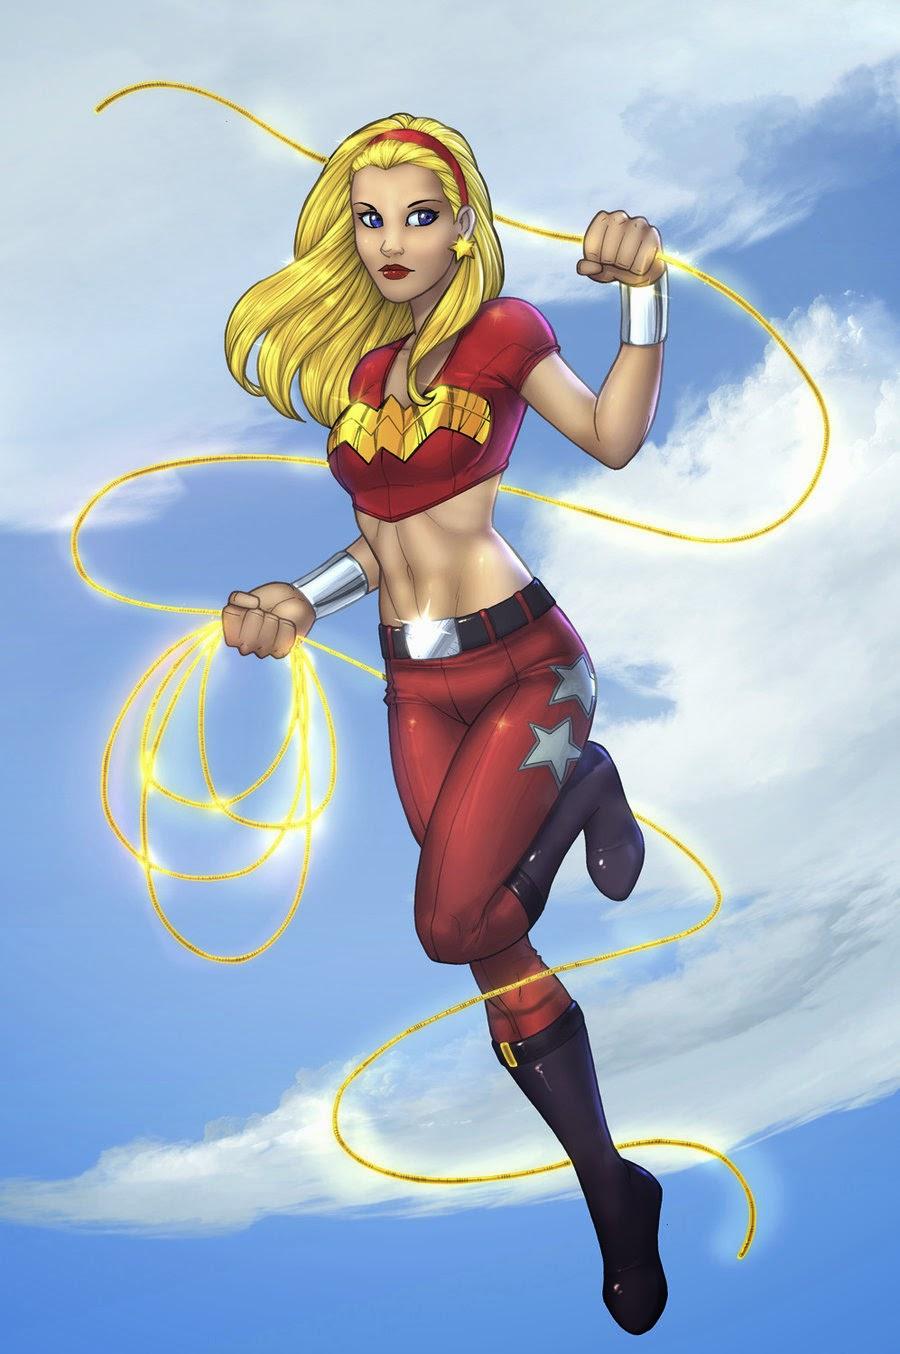 Kumpulan Gambar Wonder Girl Gambar Lucu Terbaru Cartoon Animation